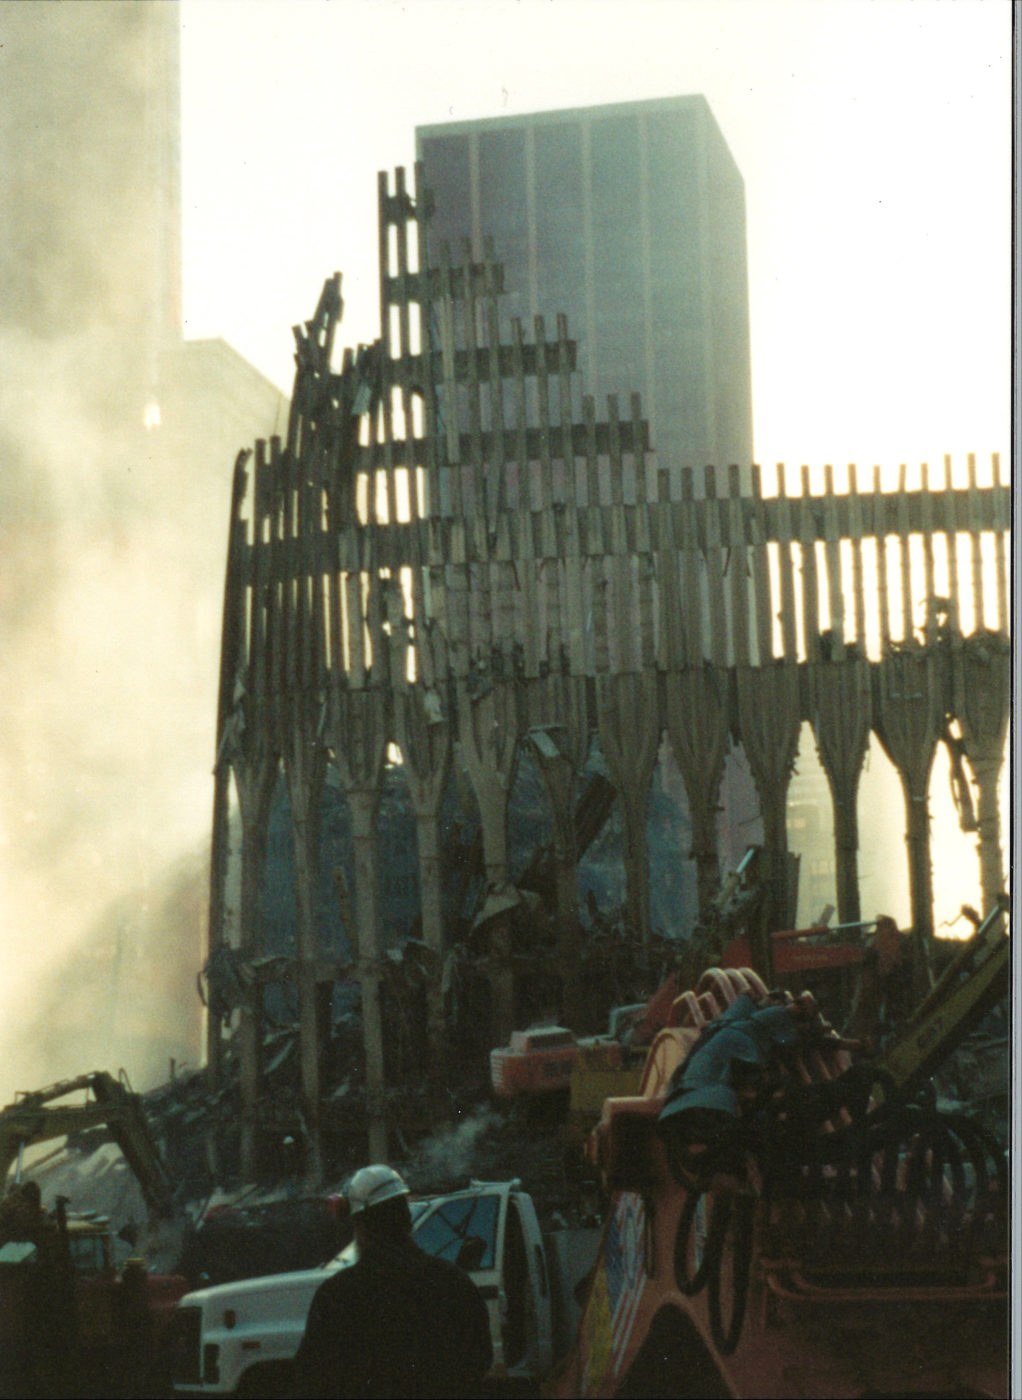 Smoke Rising Through Destroyed Exoskeleton